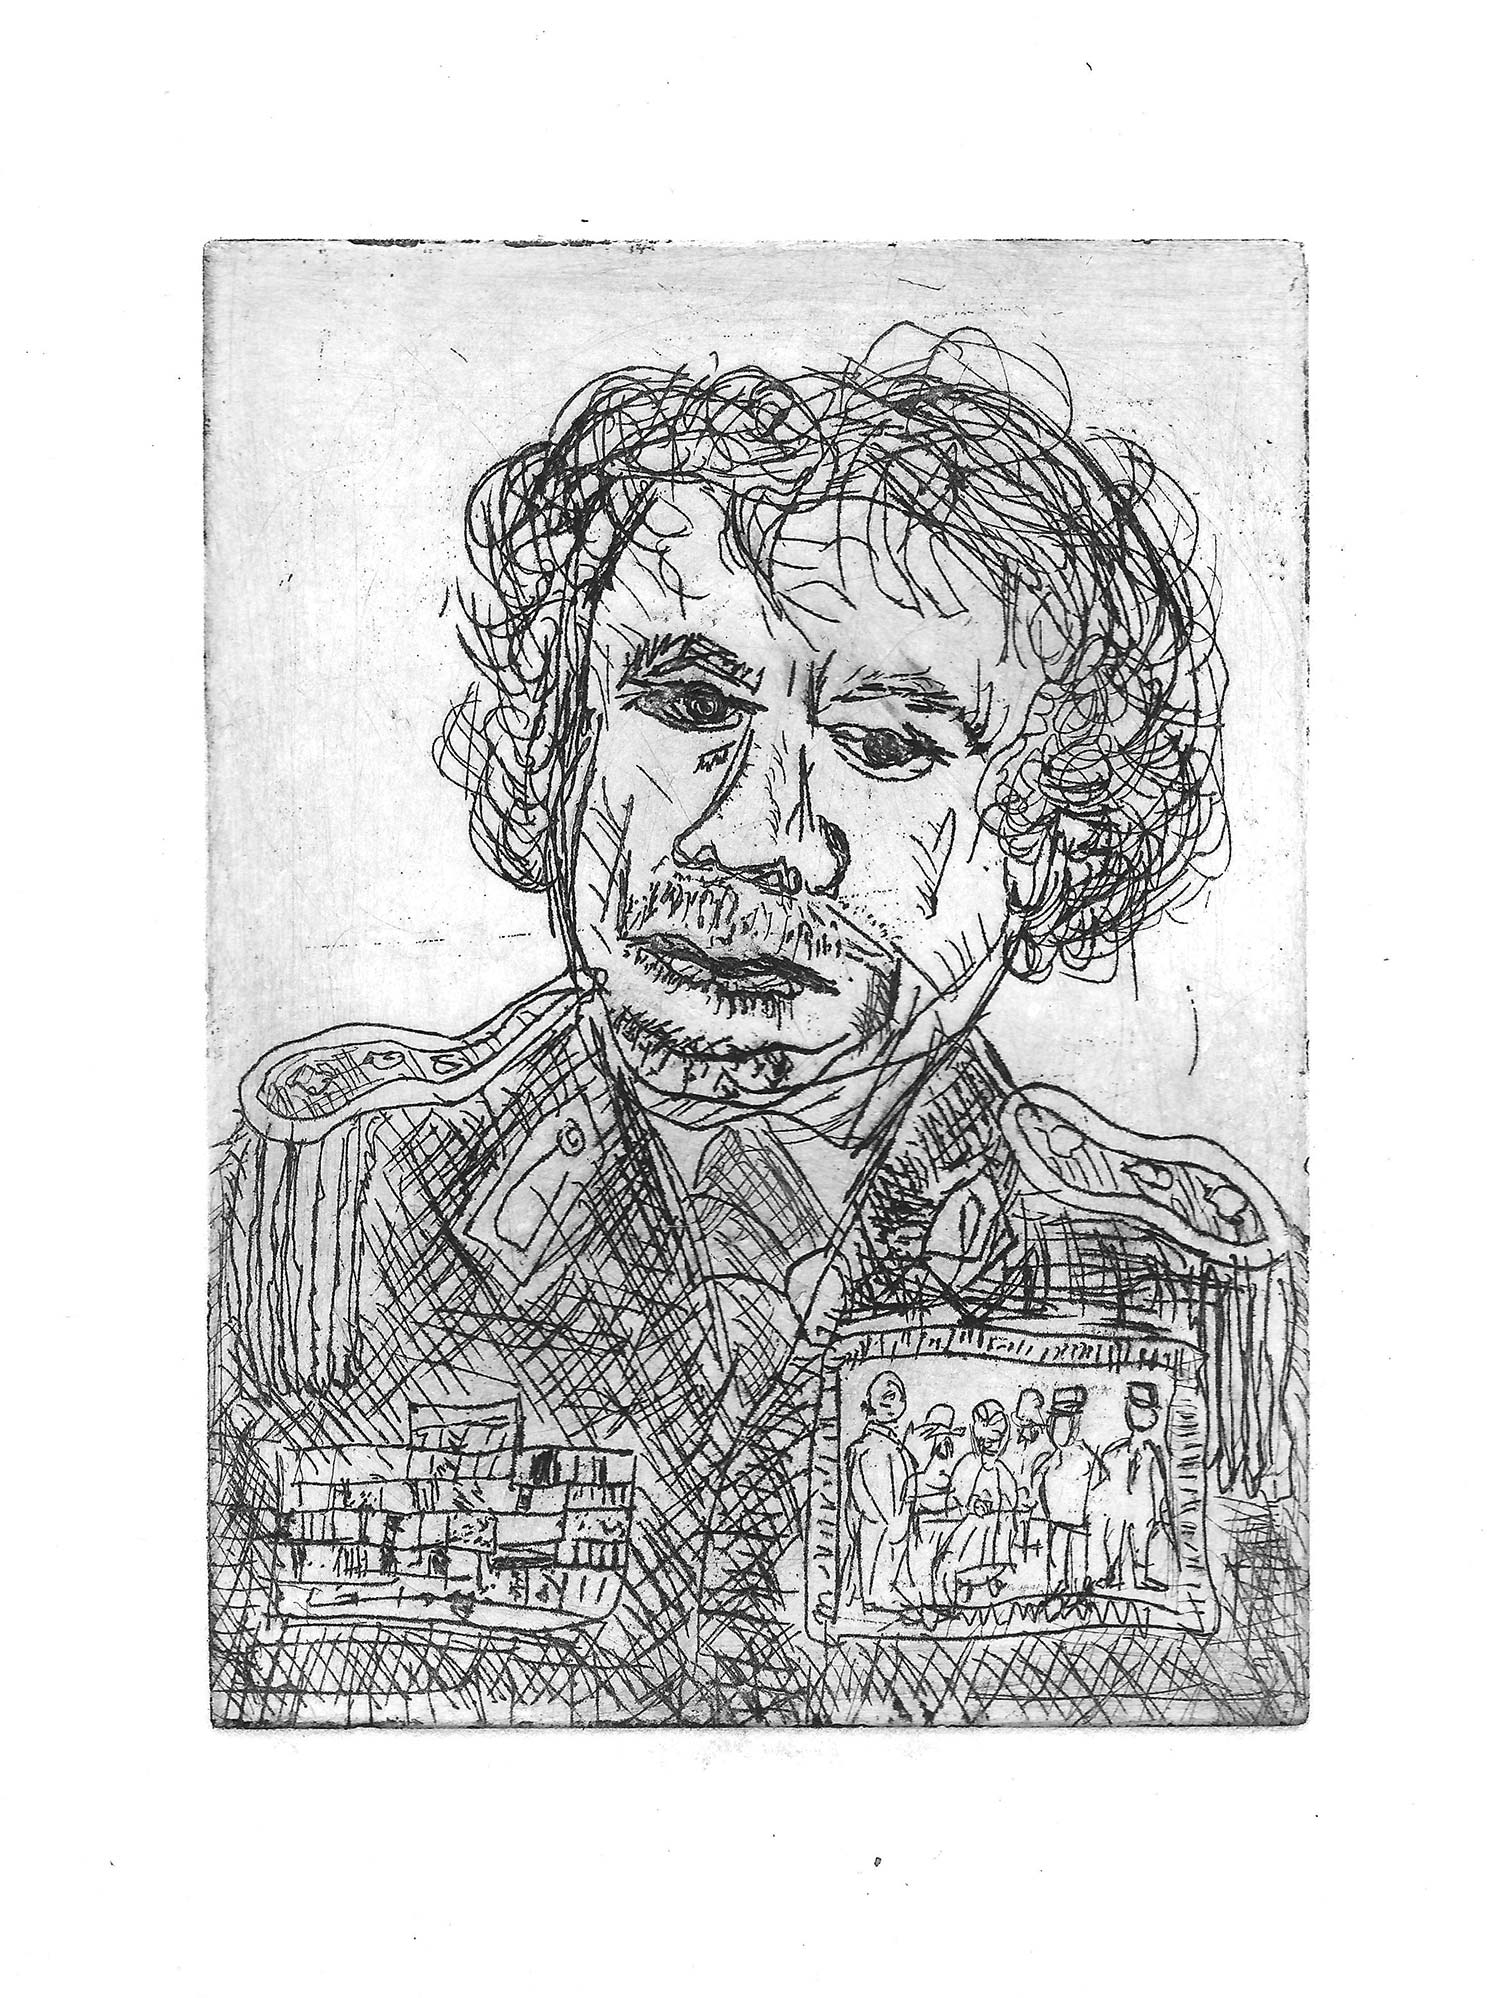 Khadaffi,-ets-001